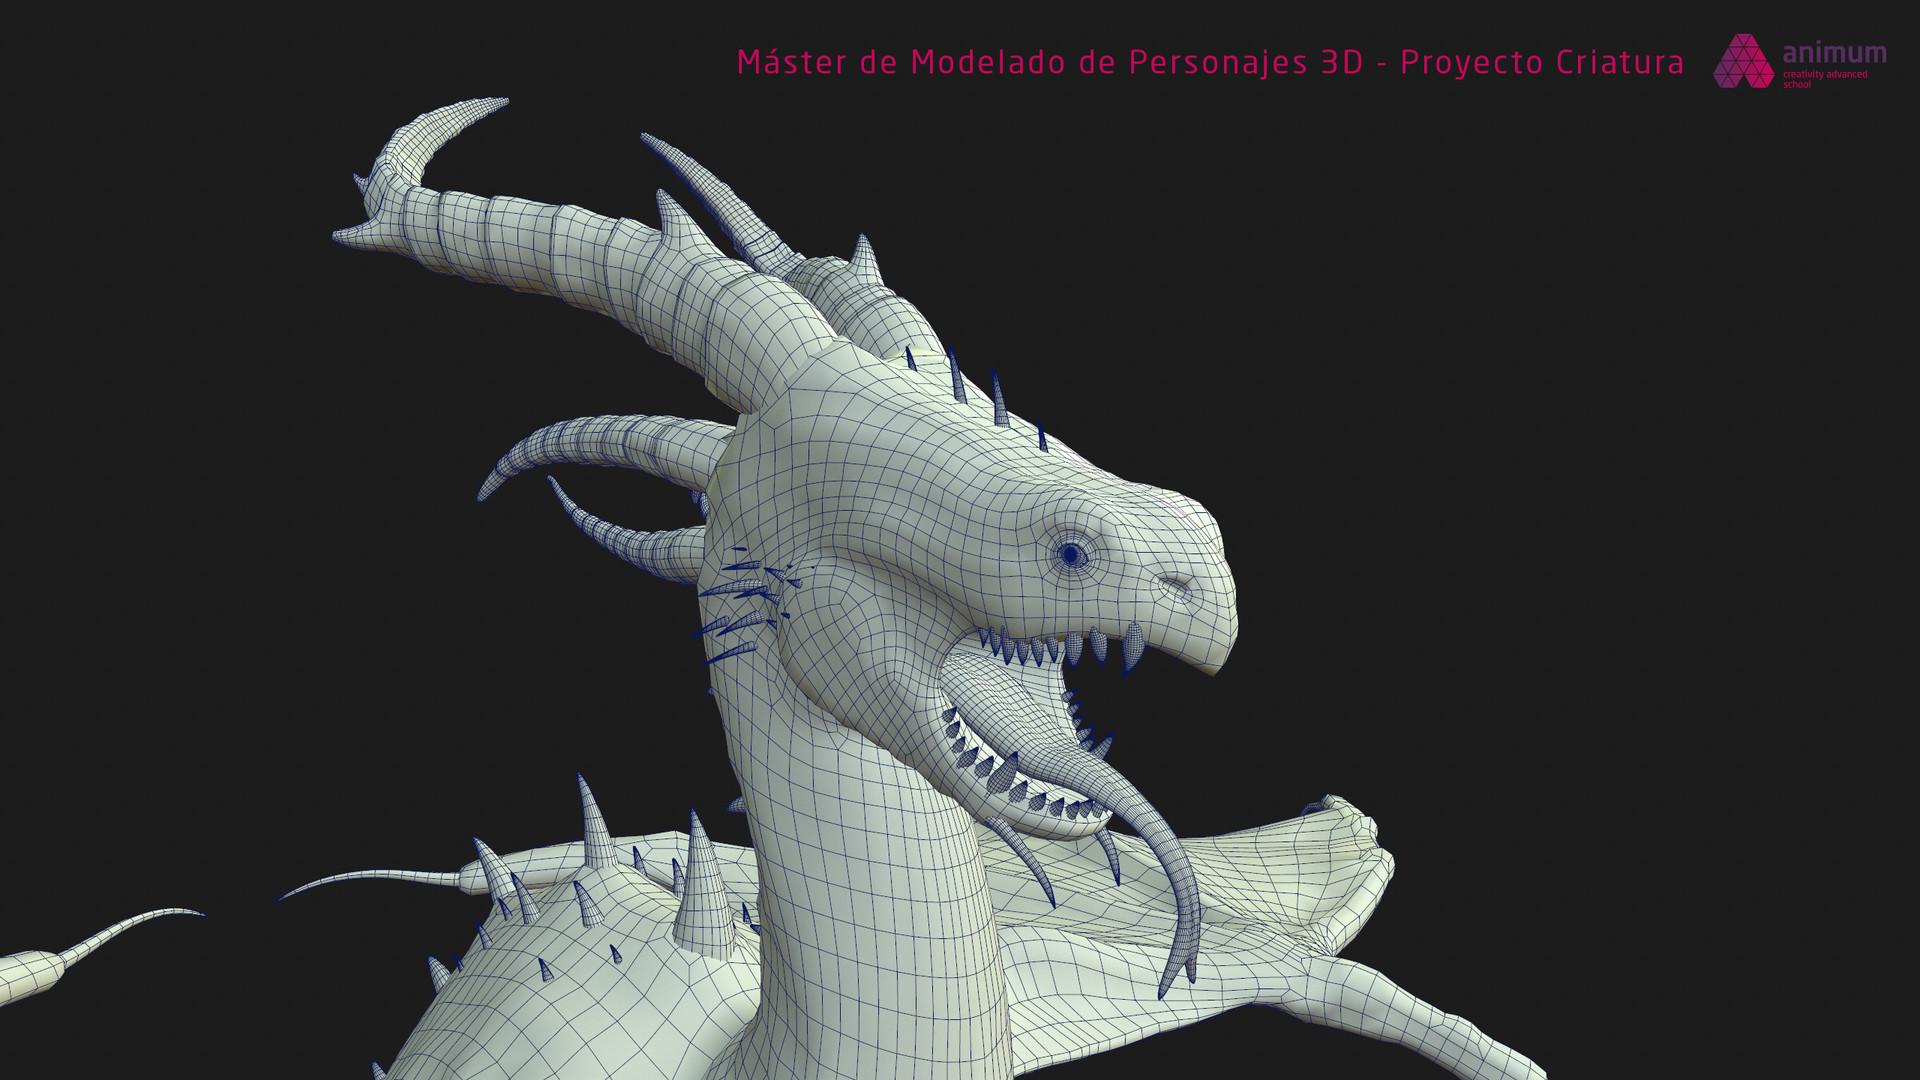 Miquel purra modelado 3d criatura miquel purra hex front wire